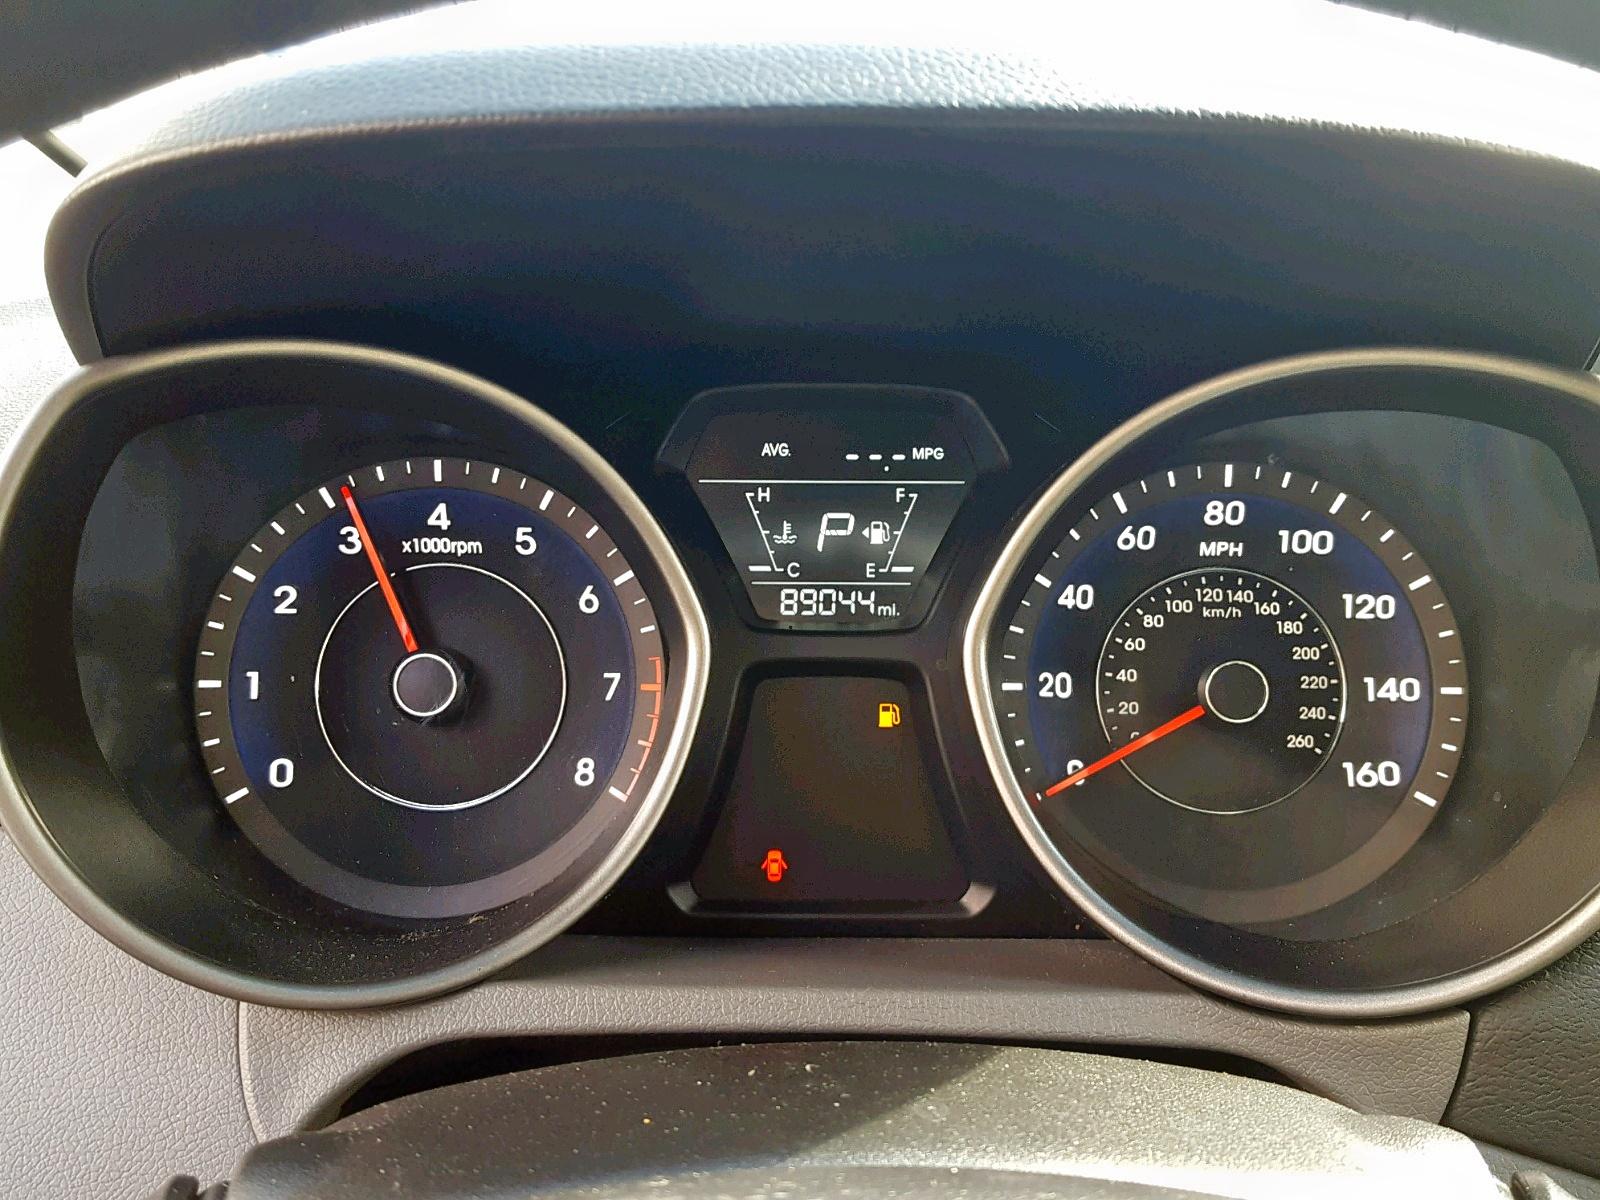 2015 Hyundai Elantra Se 1.8L front view